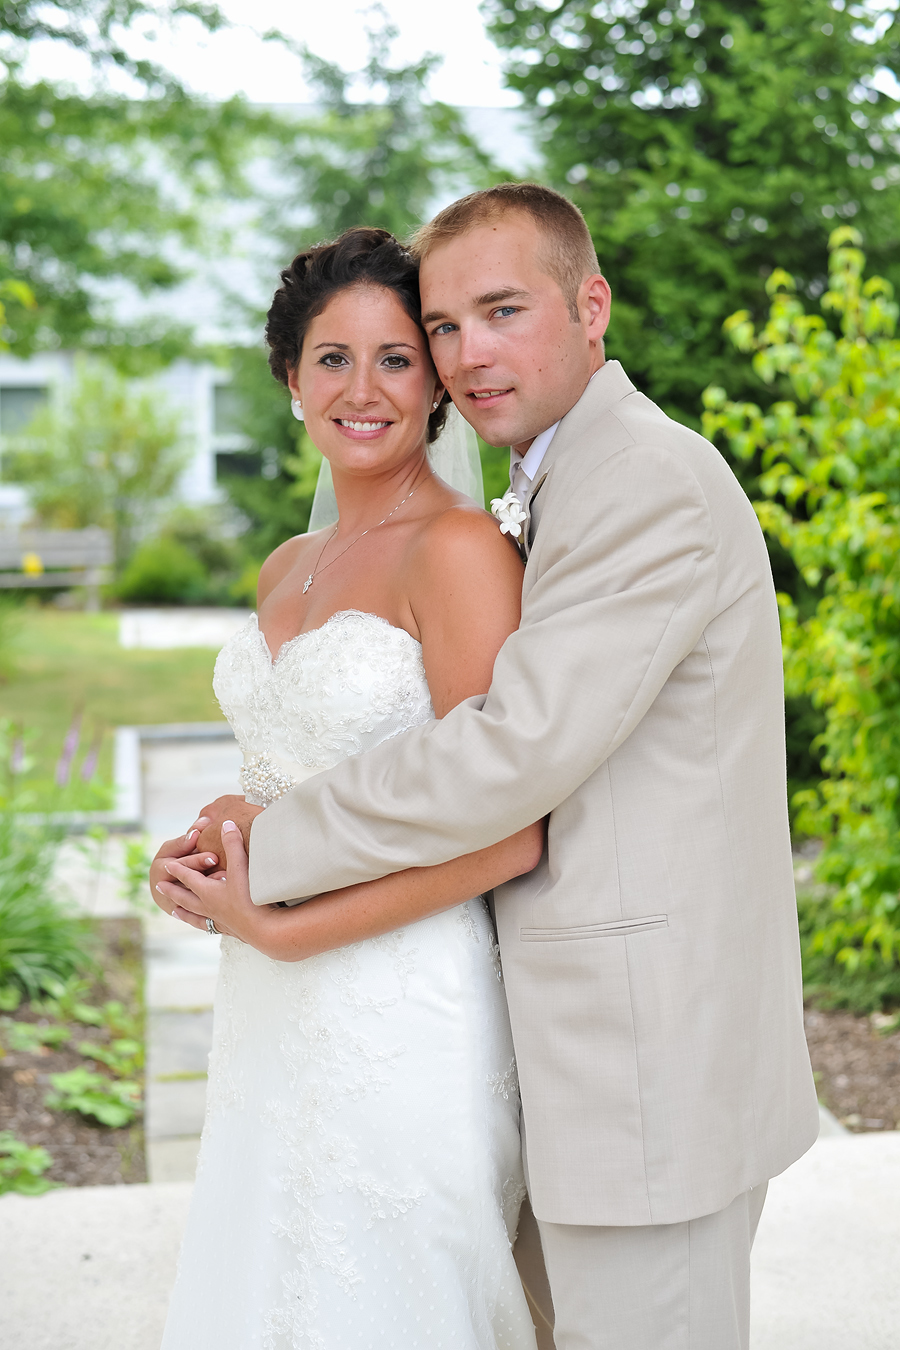 Maineweddingphotographer-41.original.full